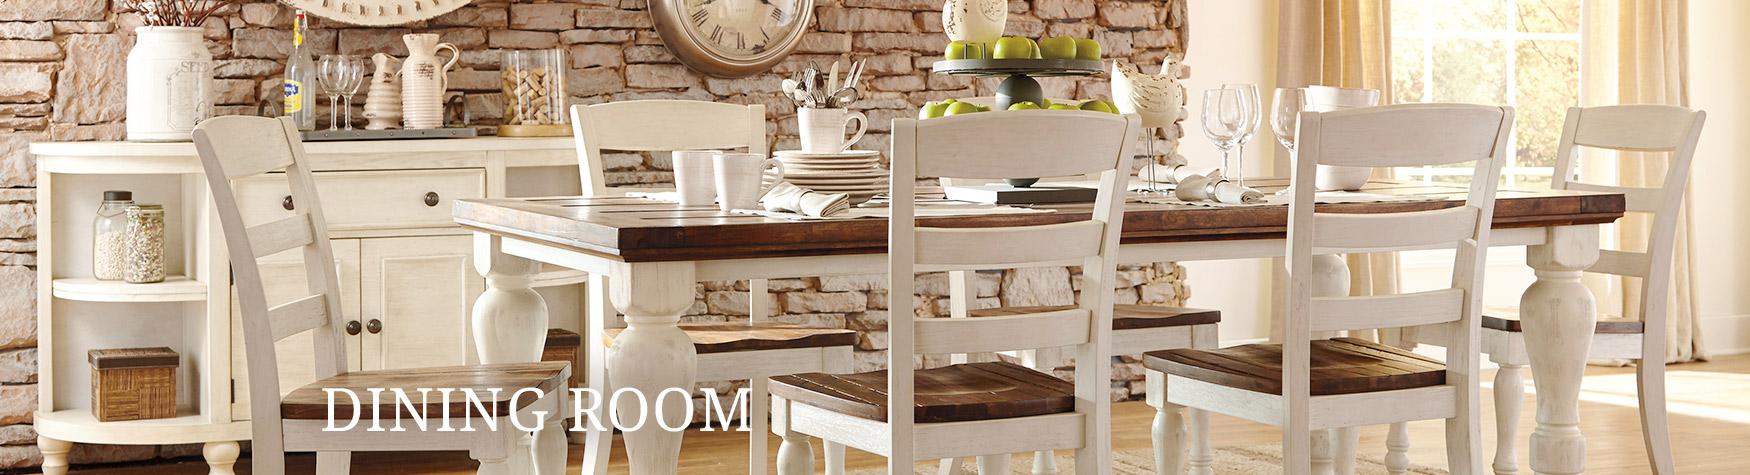 dining-room-banner-1.jpg